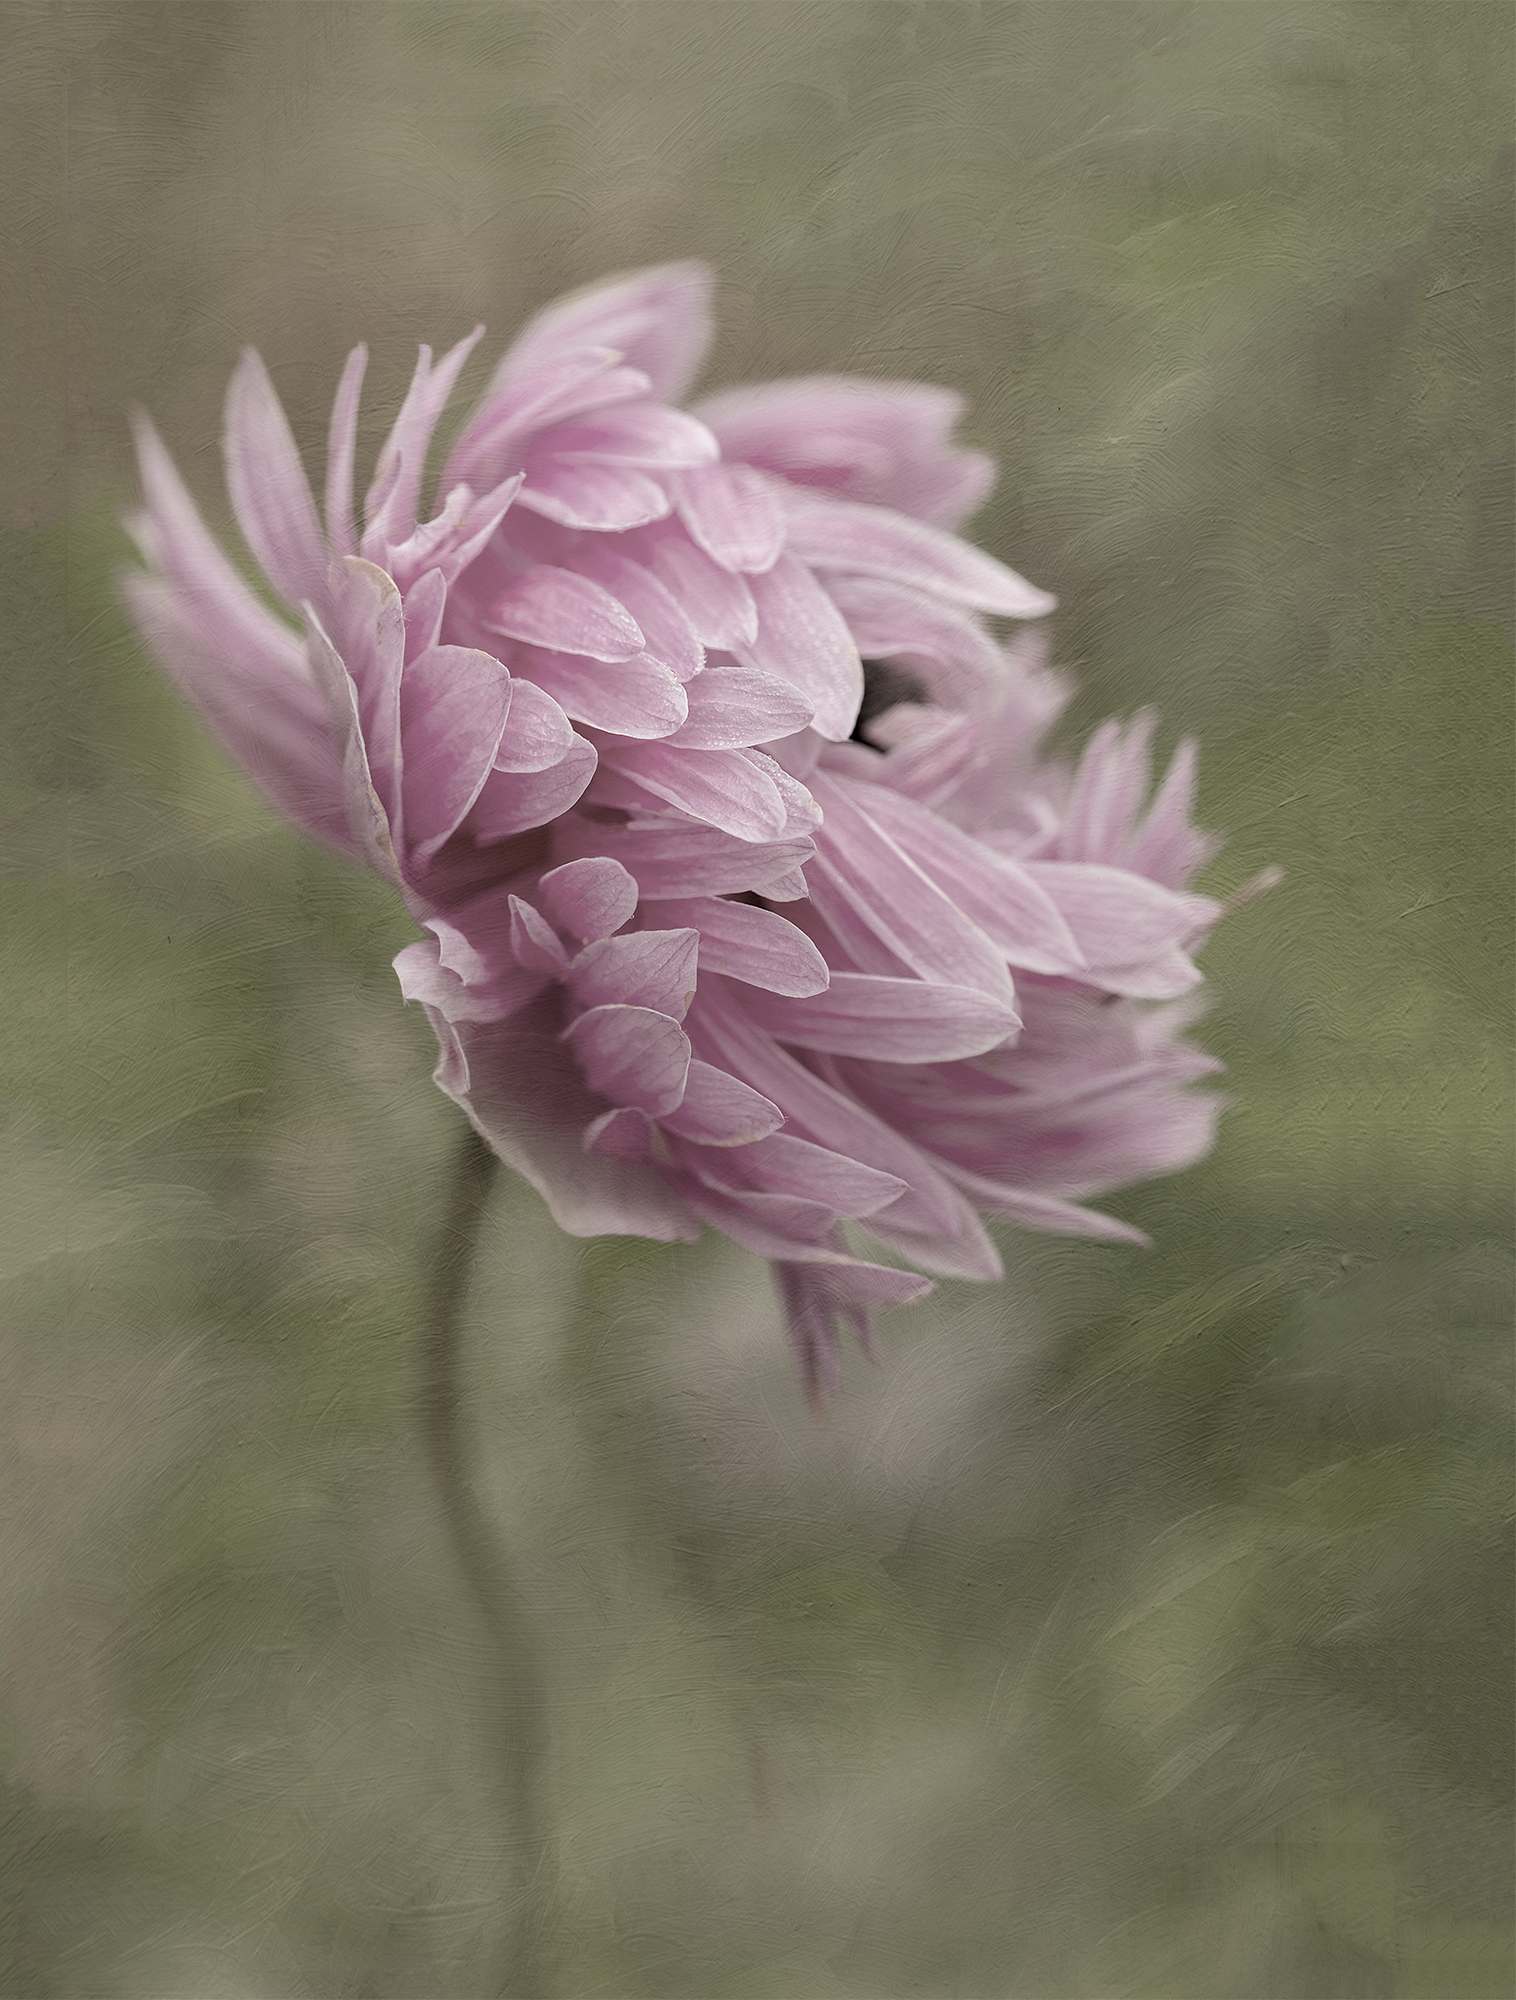 Foggy am double anemone-16x20-tinted.jpg